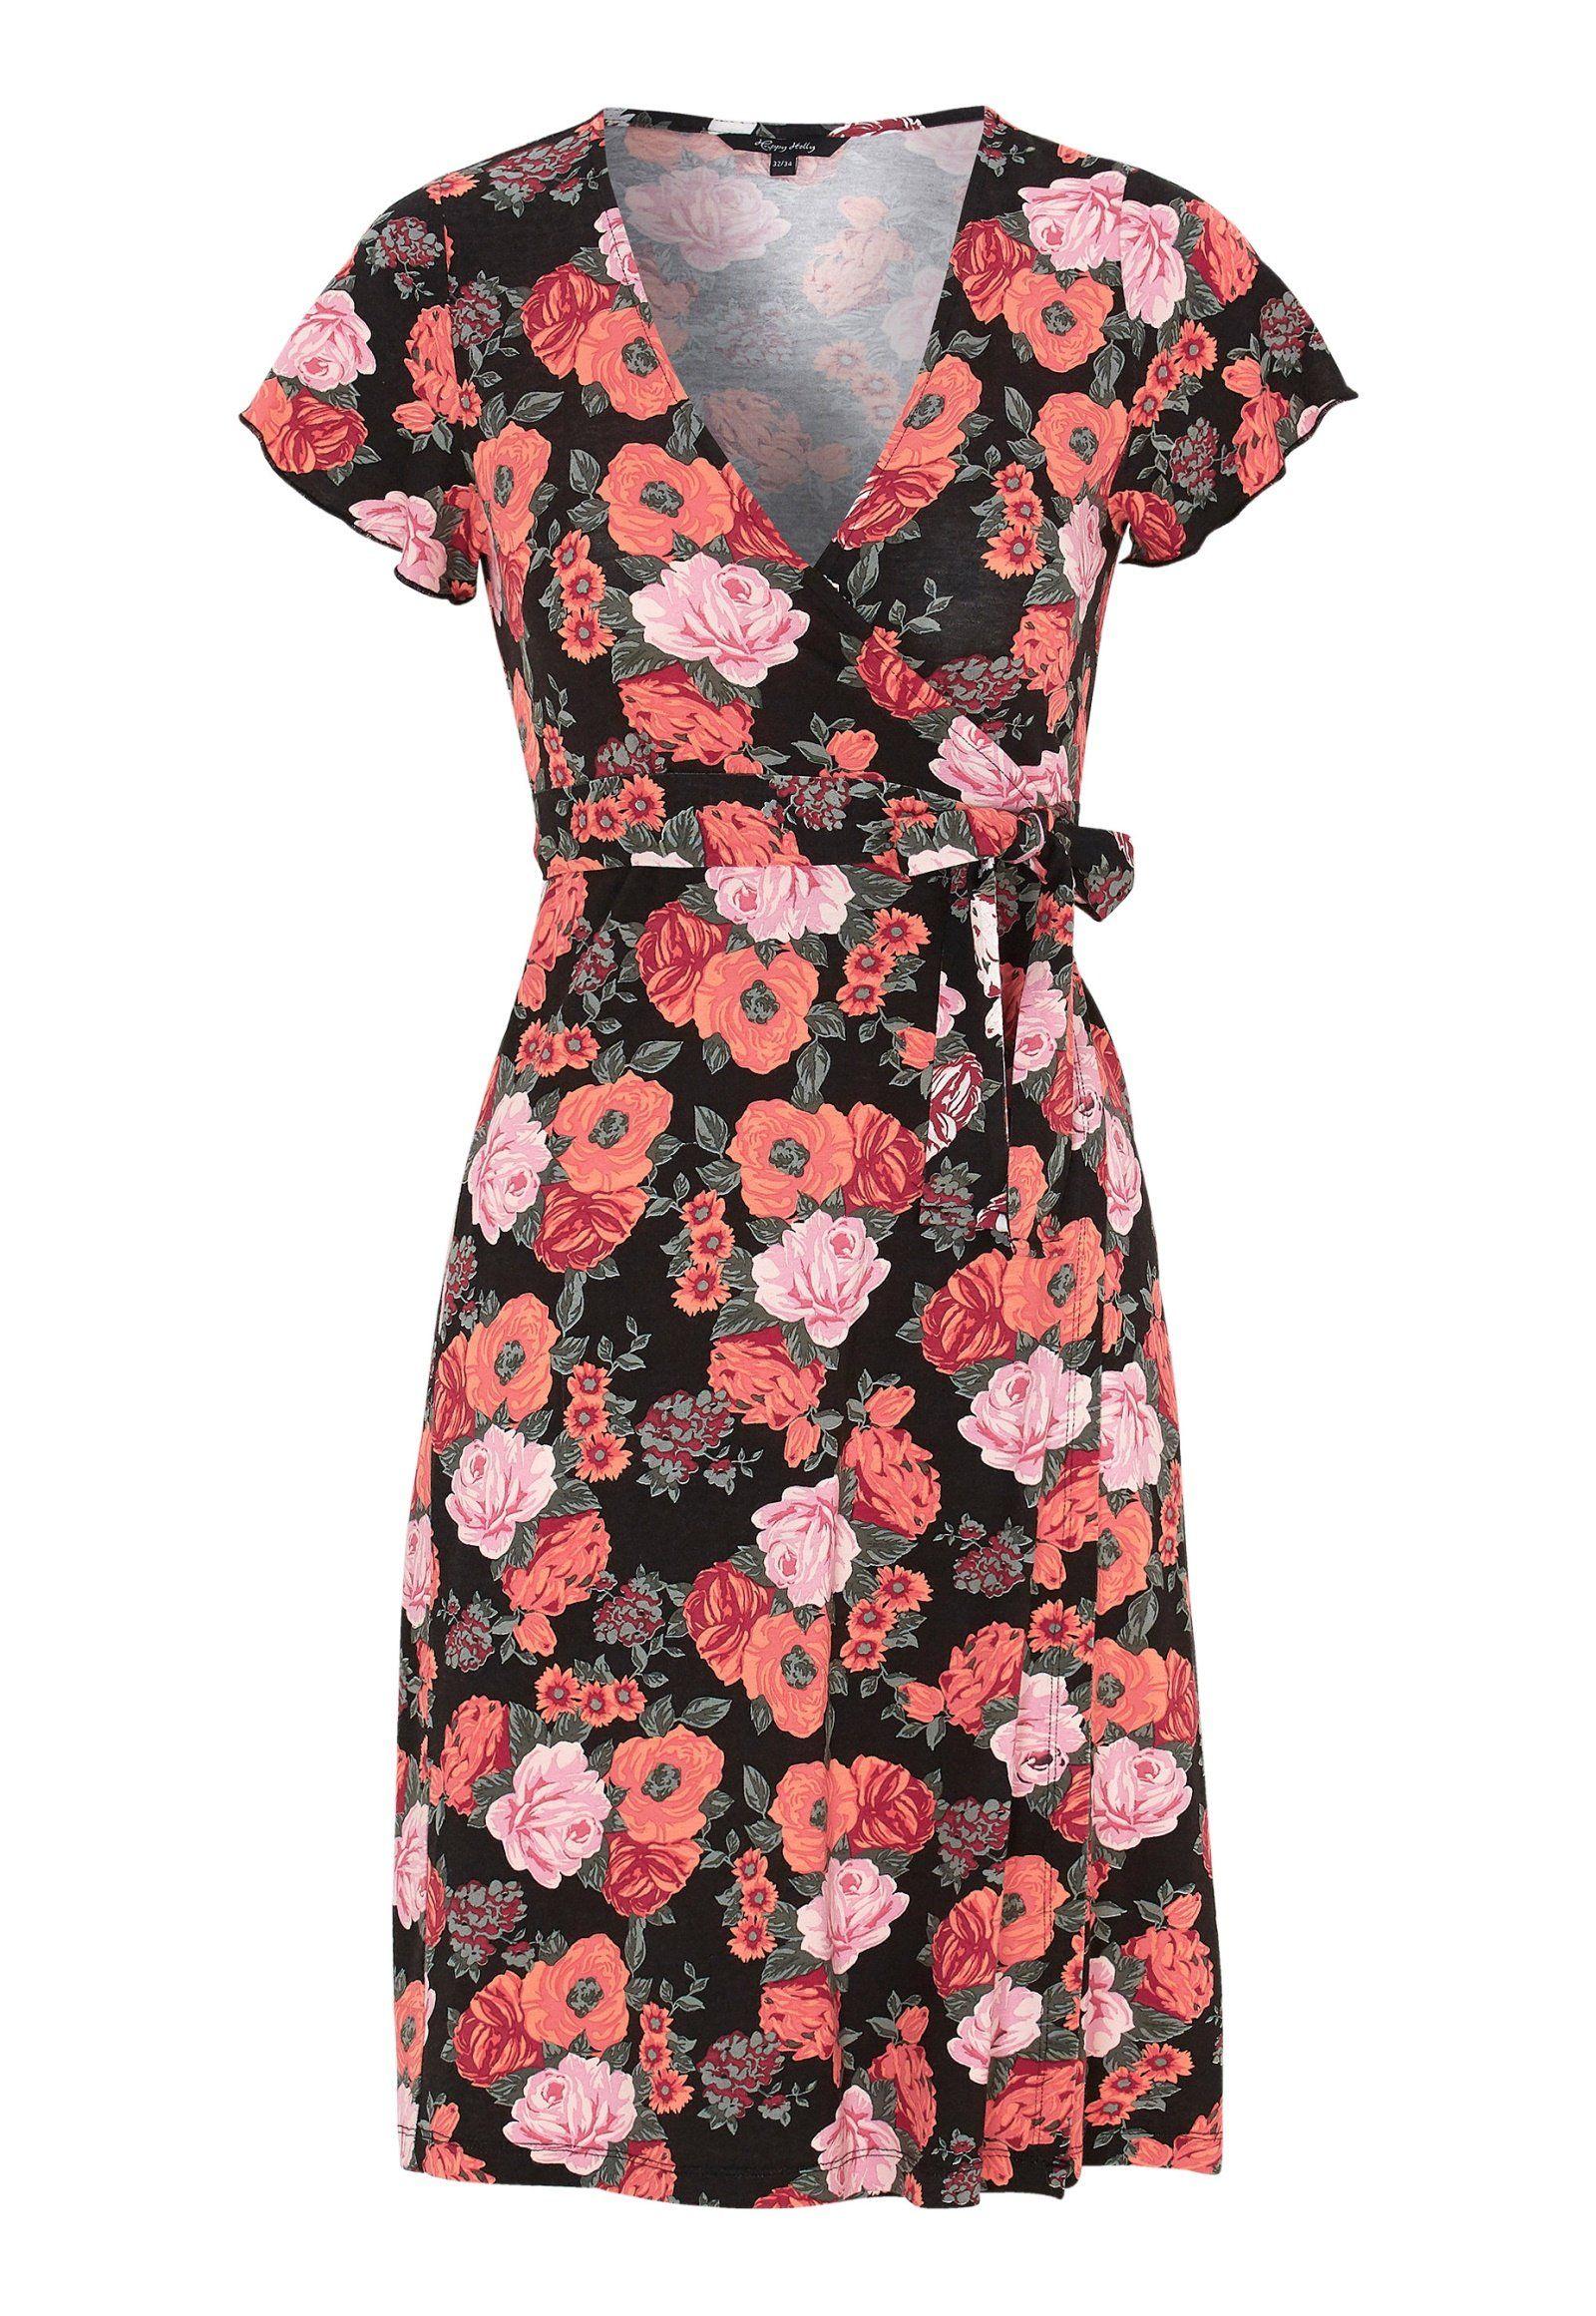 42200fdbf126 Happy Holly Amanda wrap dress Black   Patterned - Bubbleroom ...